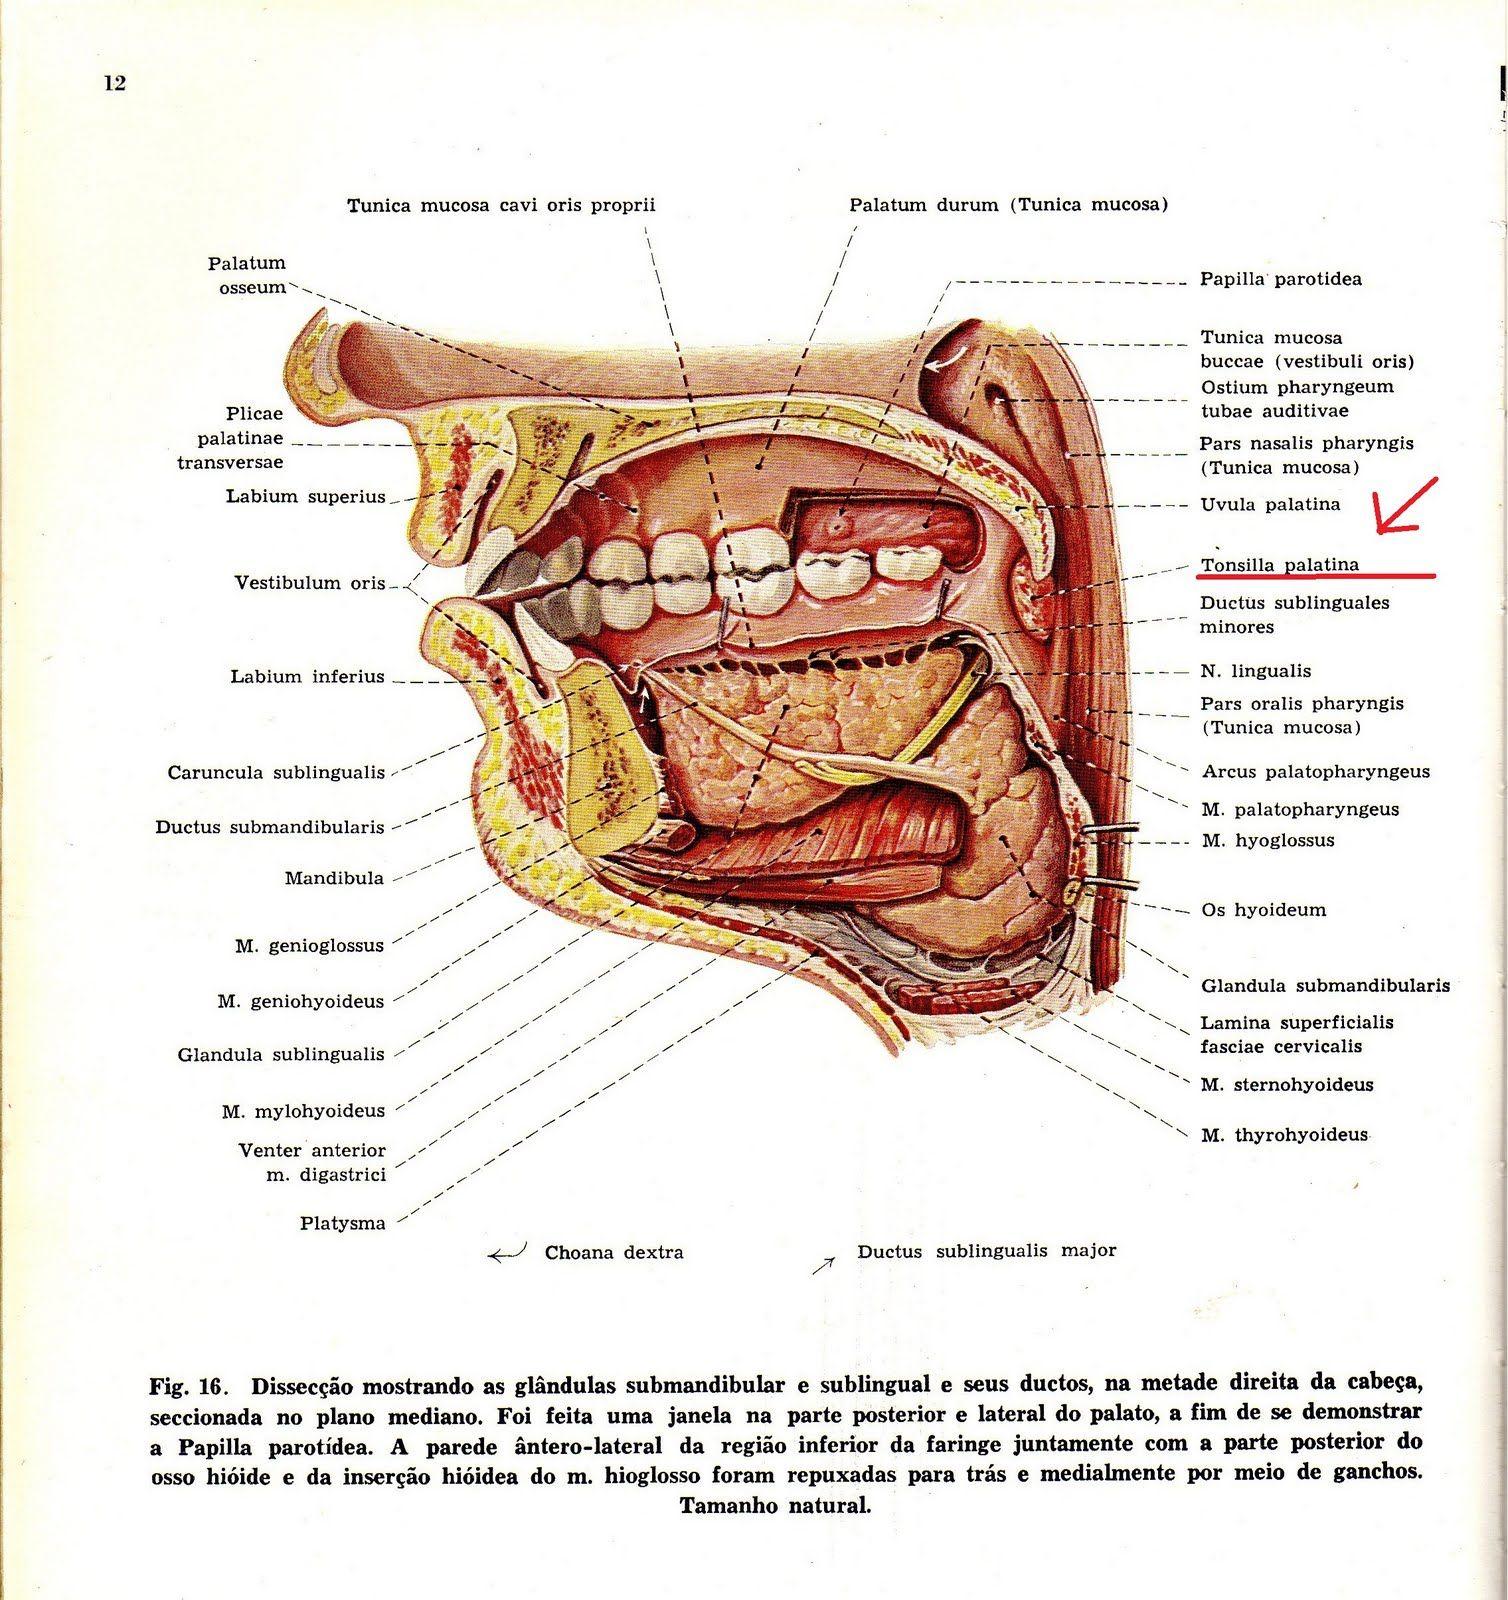 small resolution of uvula palatina s k p google